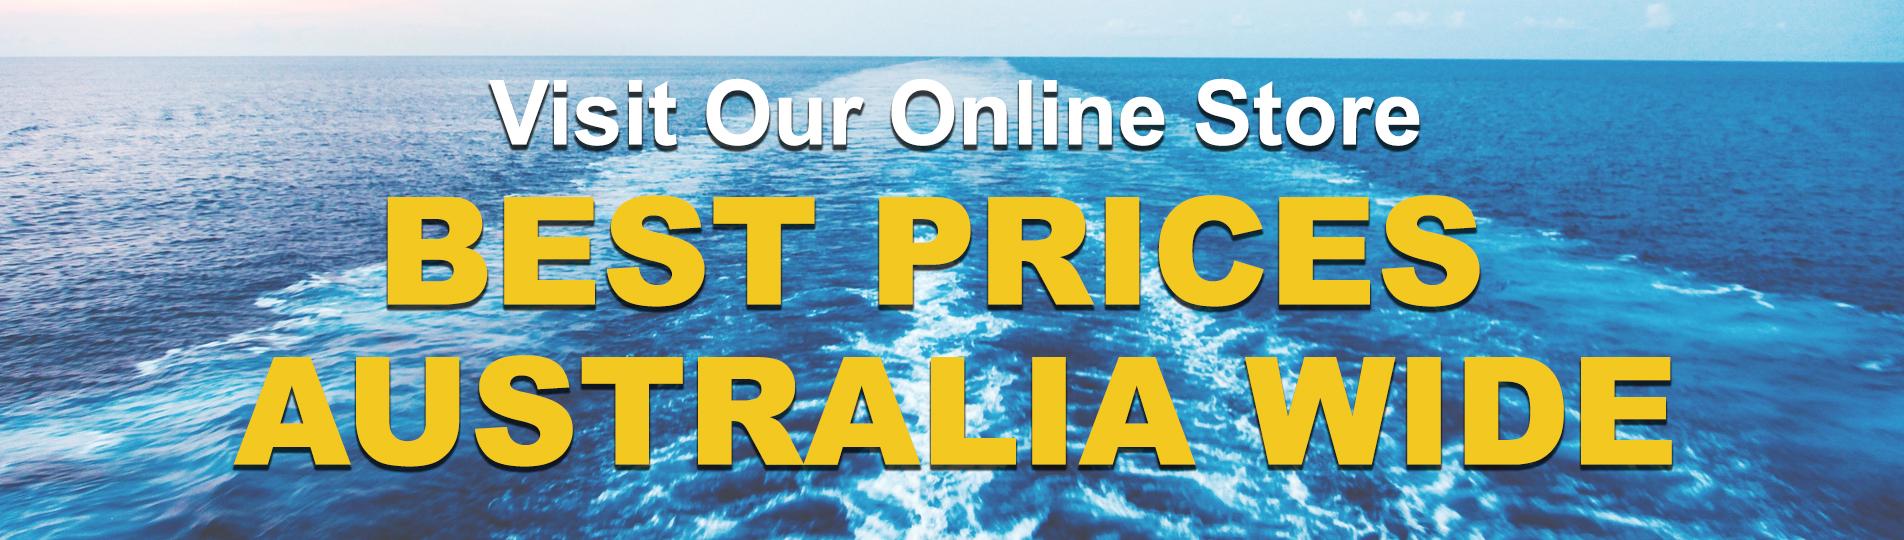 online-store-4